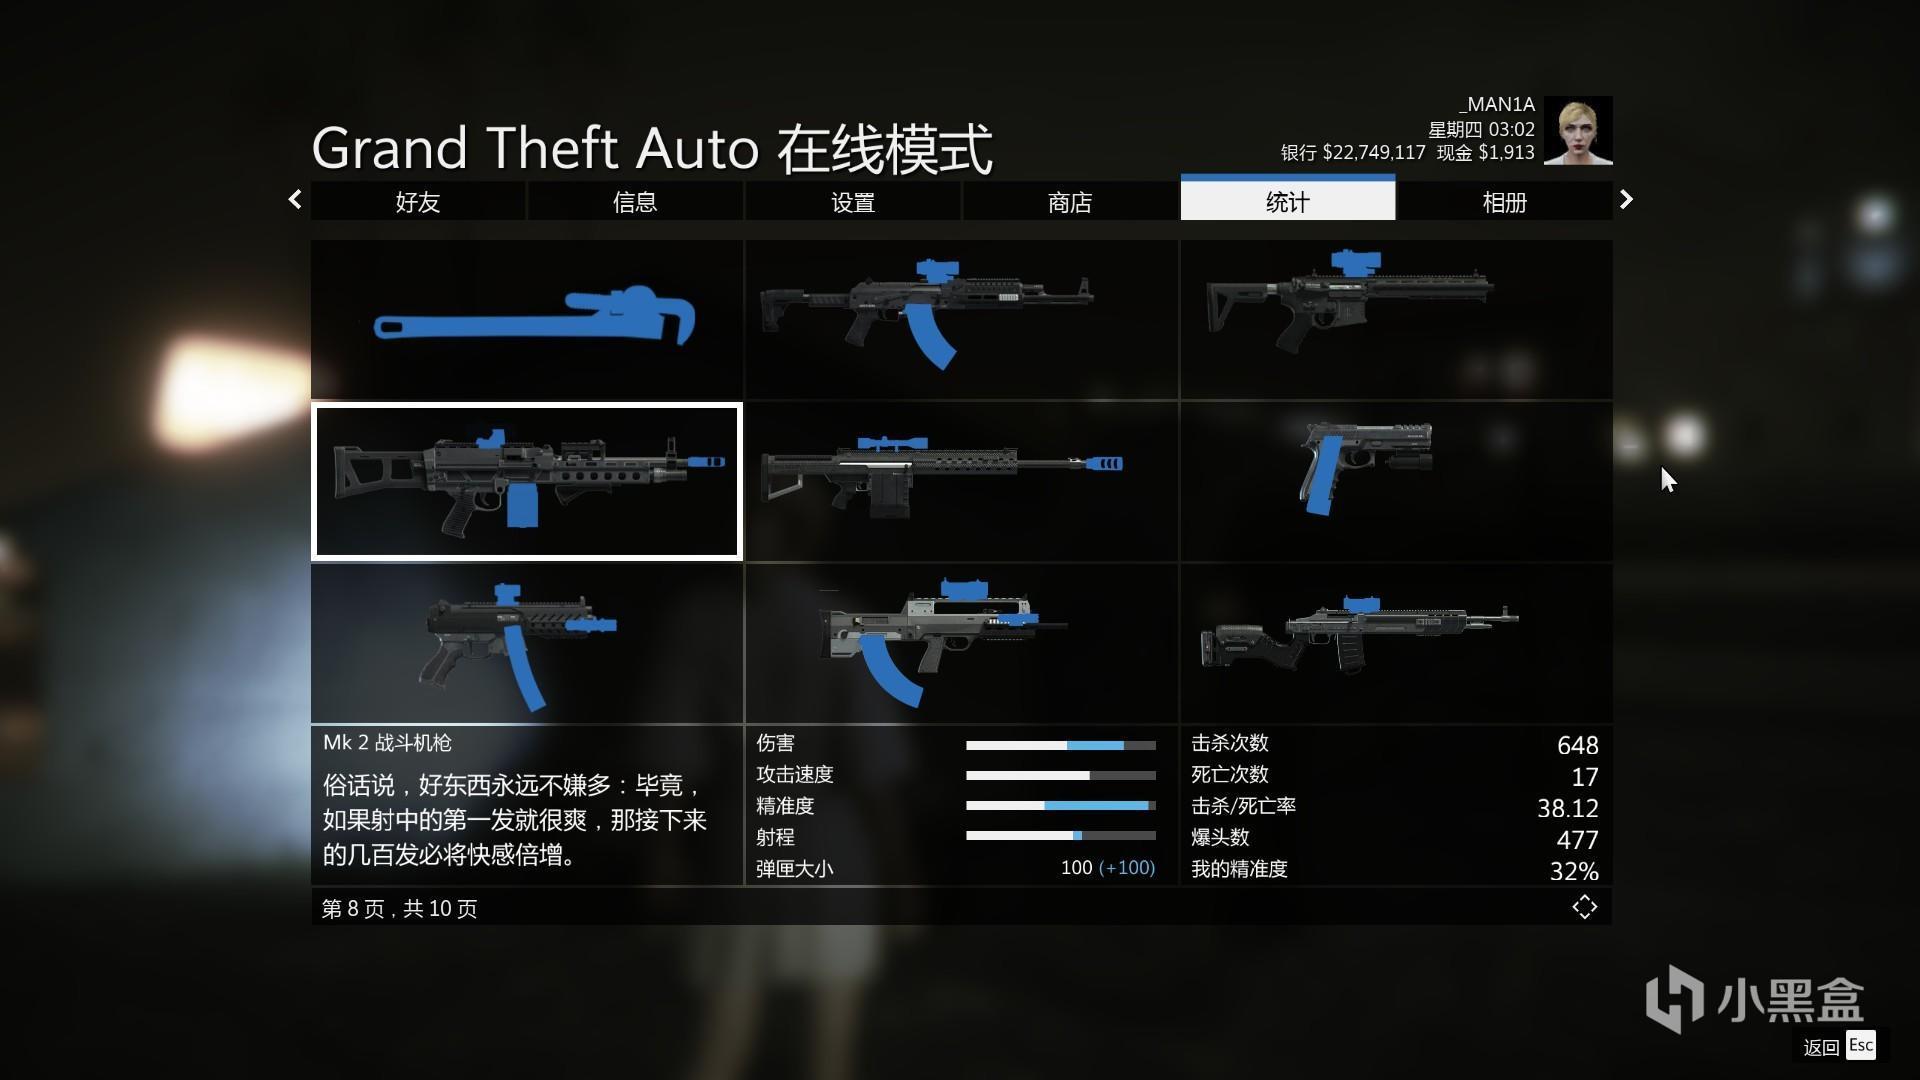 gta5 线上模式各阶段武器推荐(后期)